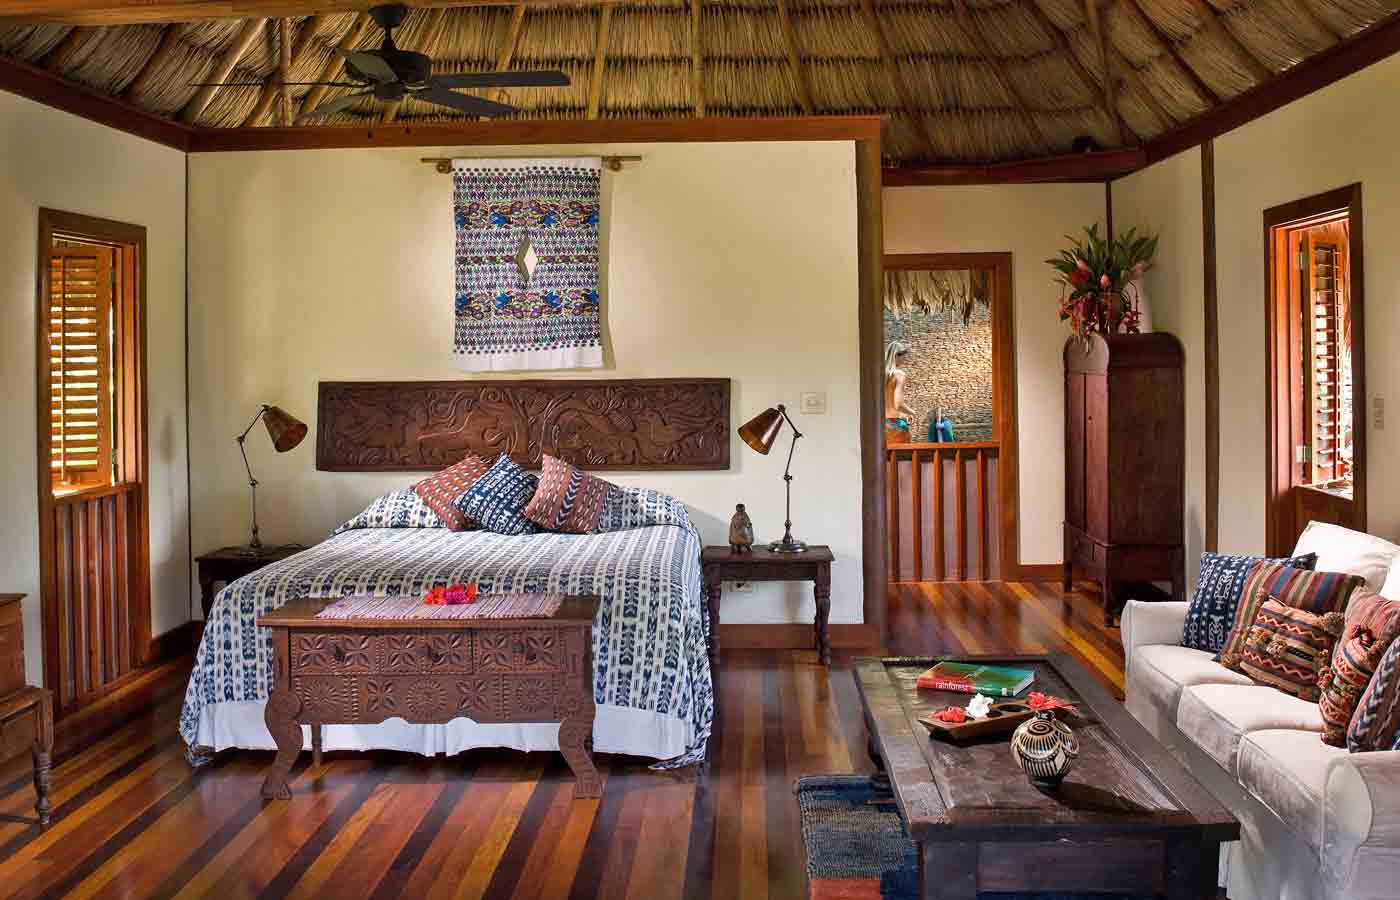 Blancaneaux Lodge, Belize, luxury Belize, Belize luxury holidays, luxury holidays to Belize, tailor-made holidays to Belize